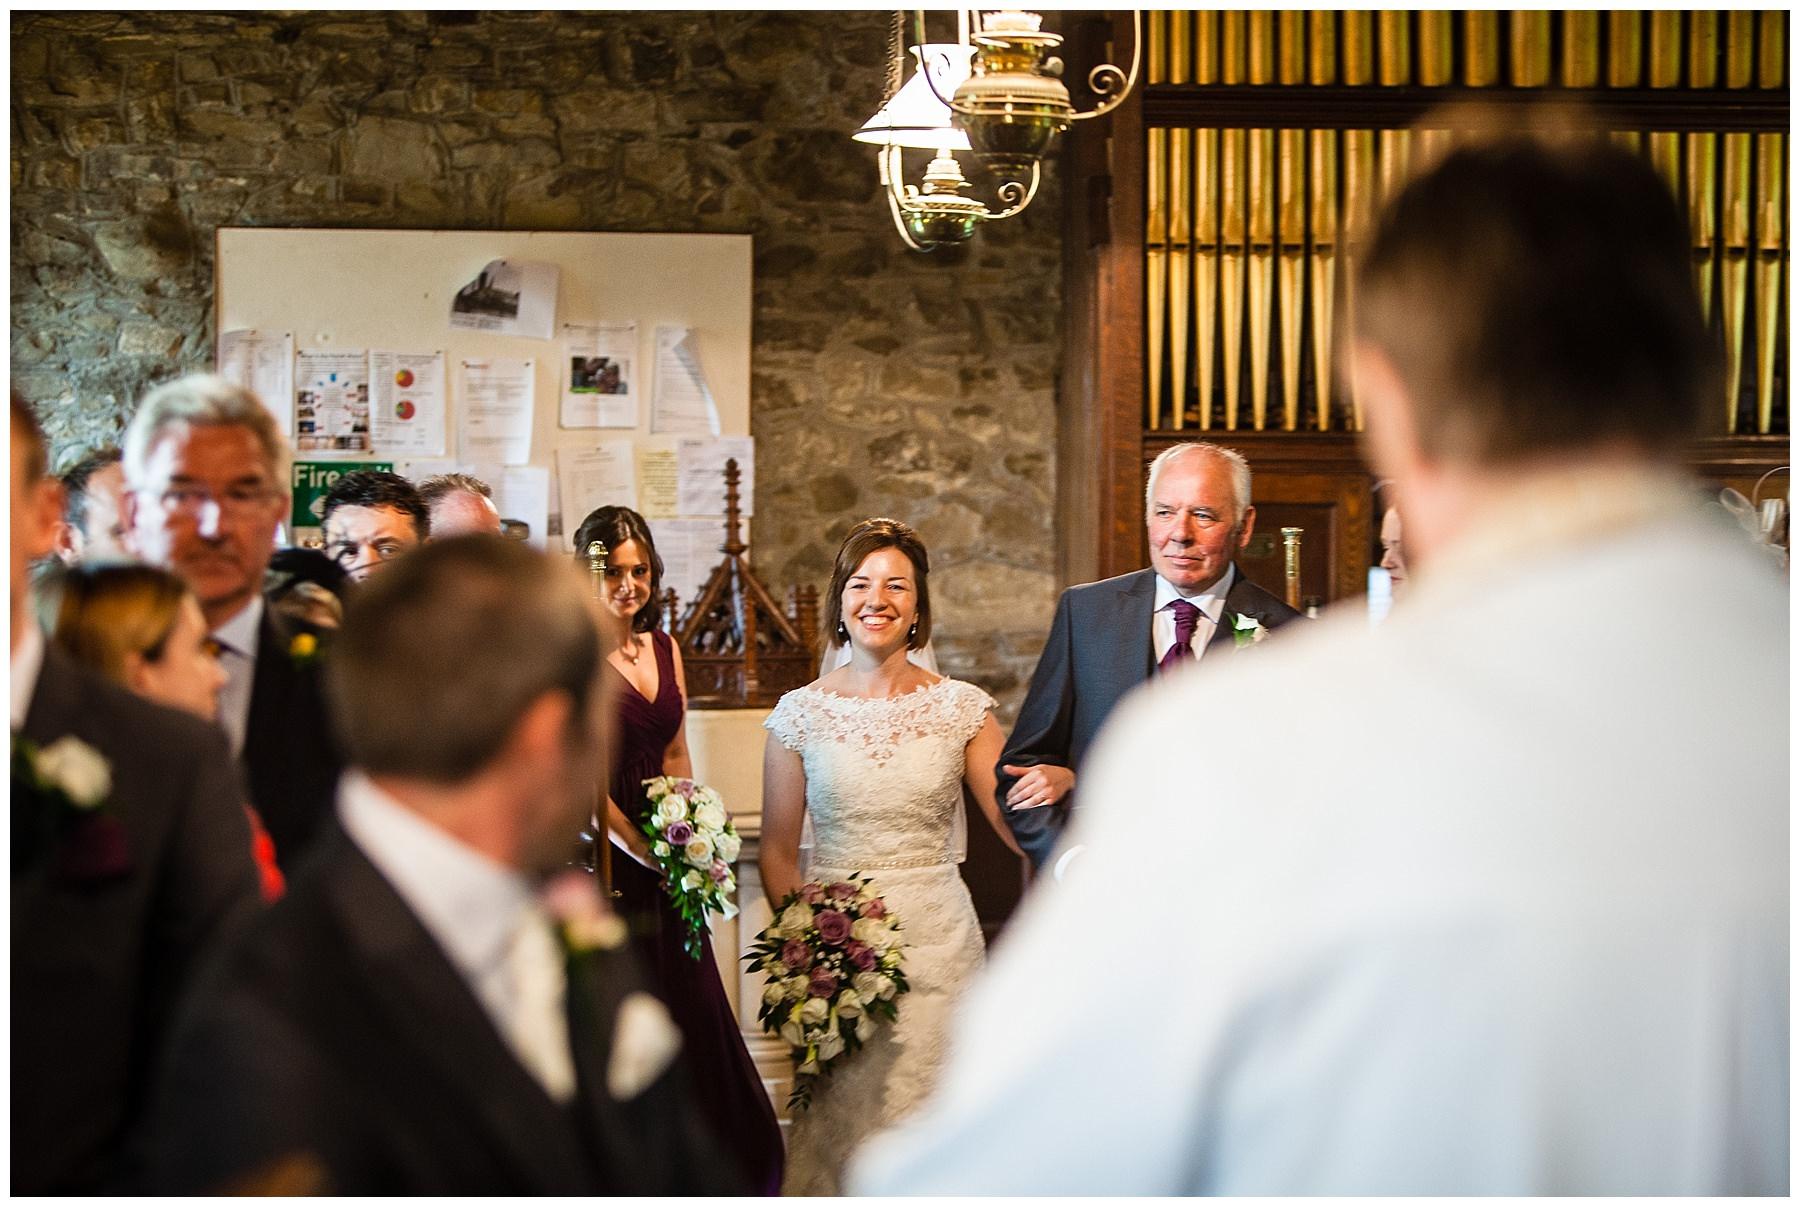 beautiful bride walking down the aisle at St.Llwchaiarn's Church, Llanmerewig